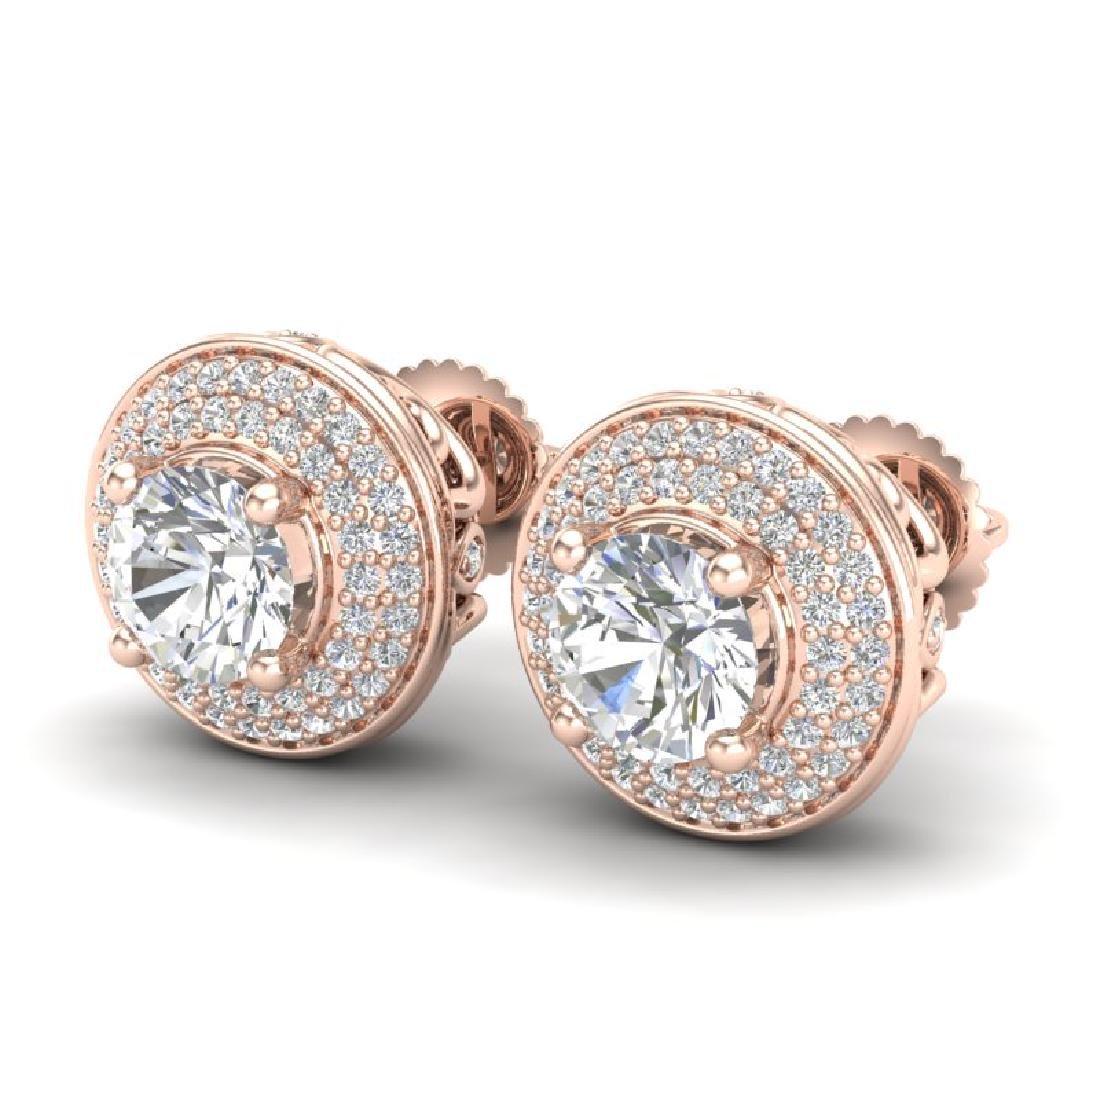 2.35 CTW VS/SI Diamond Solitaire Art Deco Stud Earrings